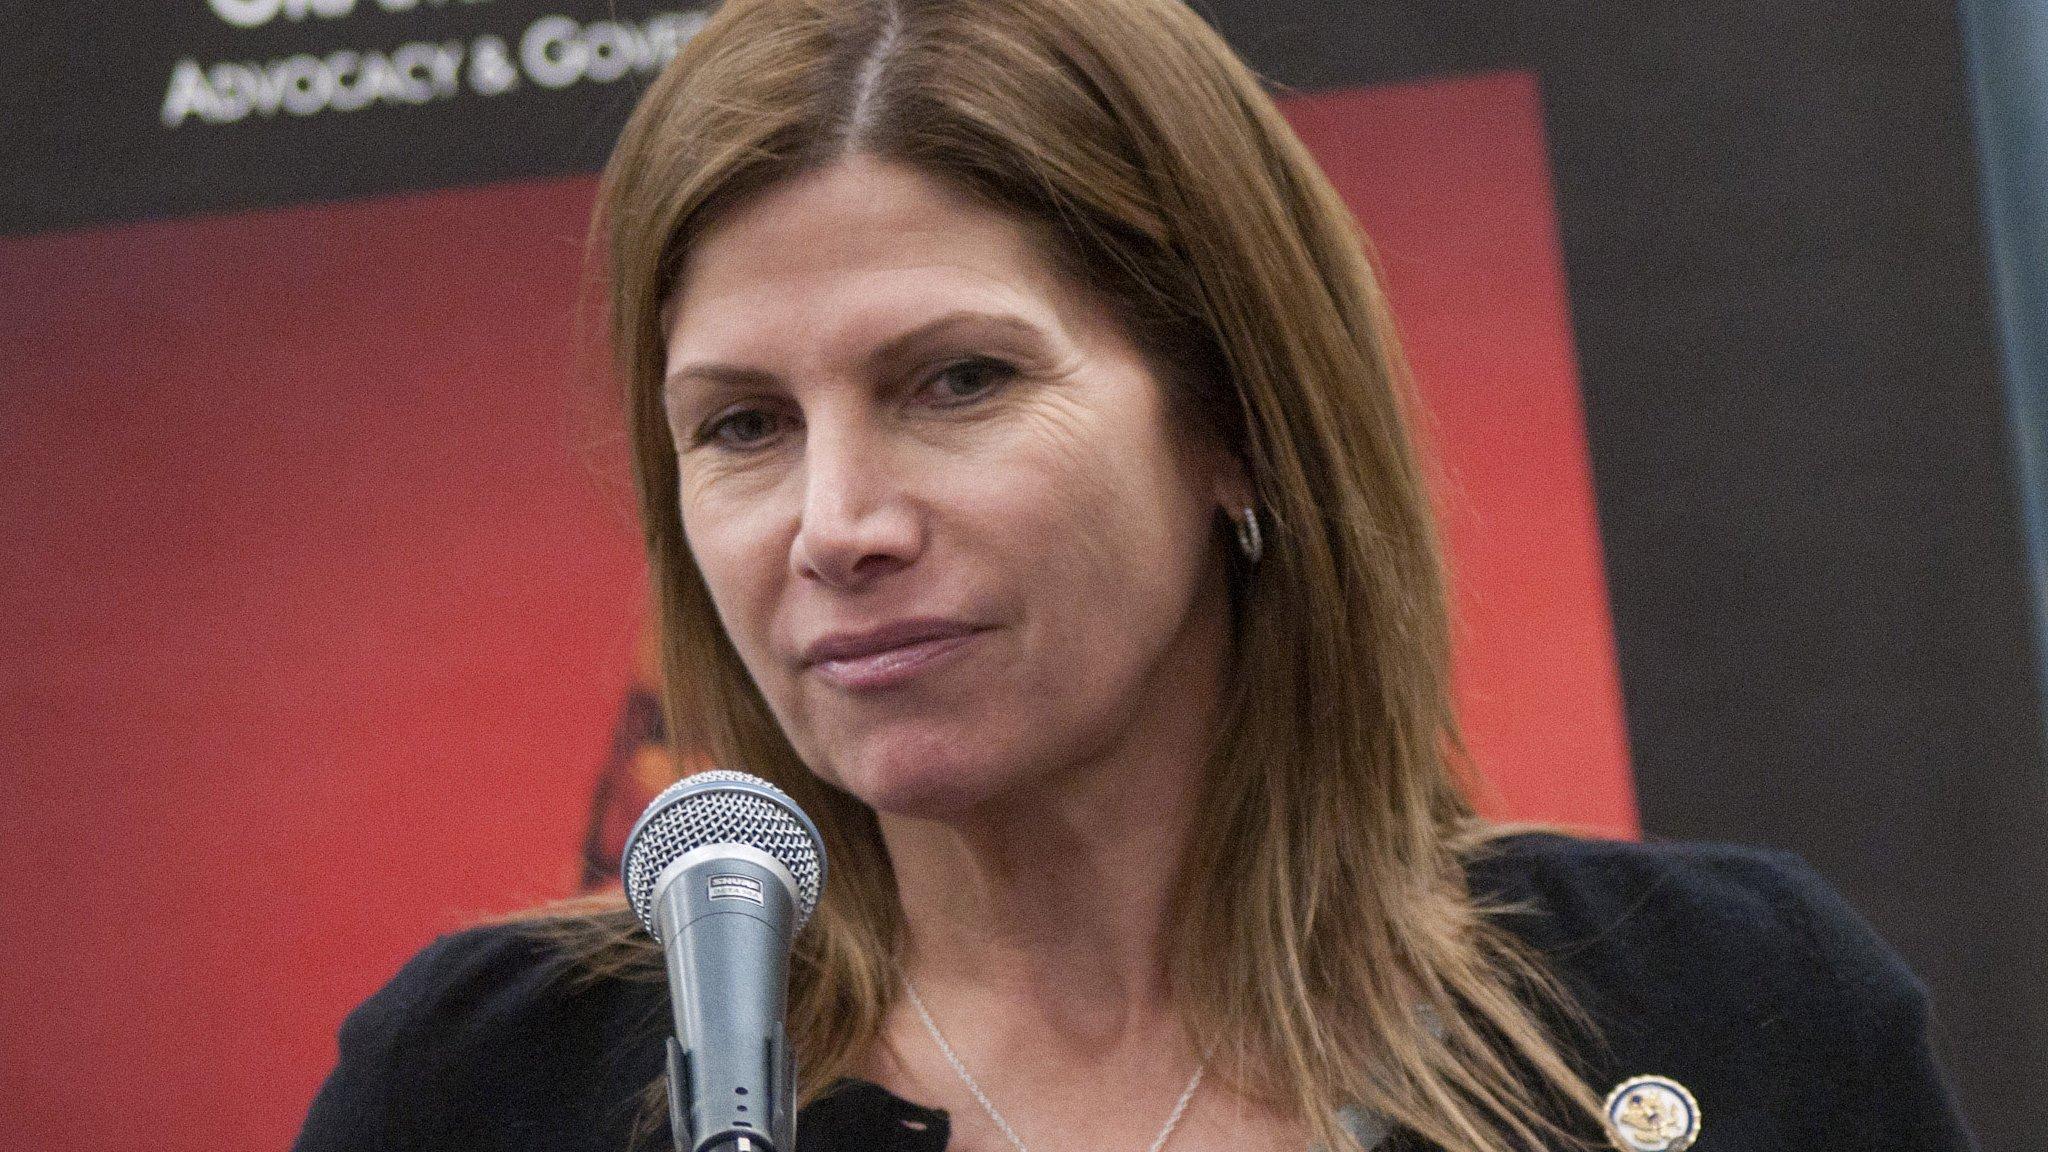 US gymnastics new interim boss Mary Bono 'regrets' anti-Nike tweet